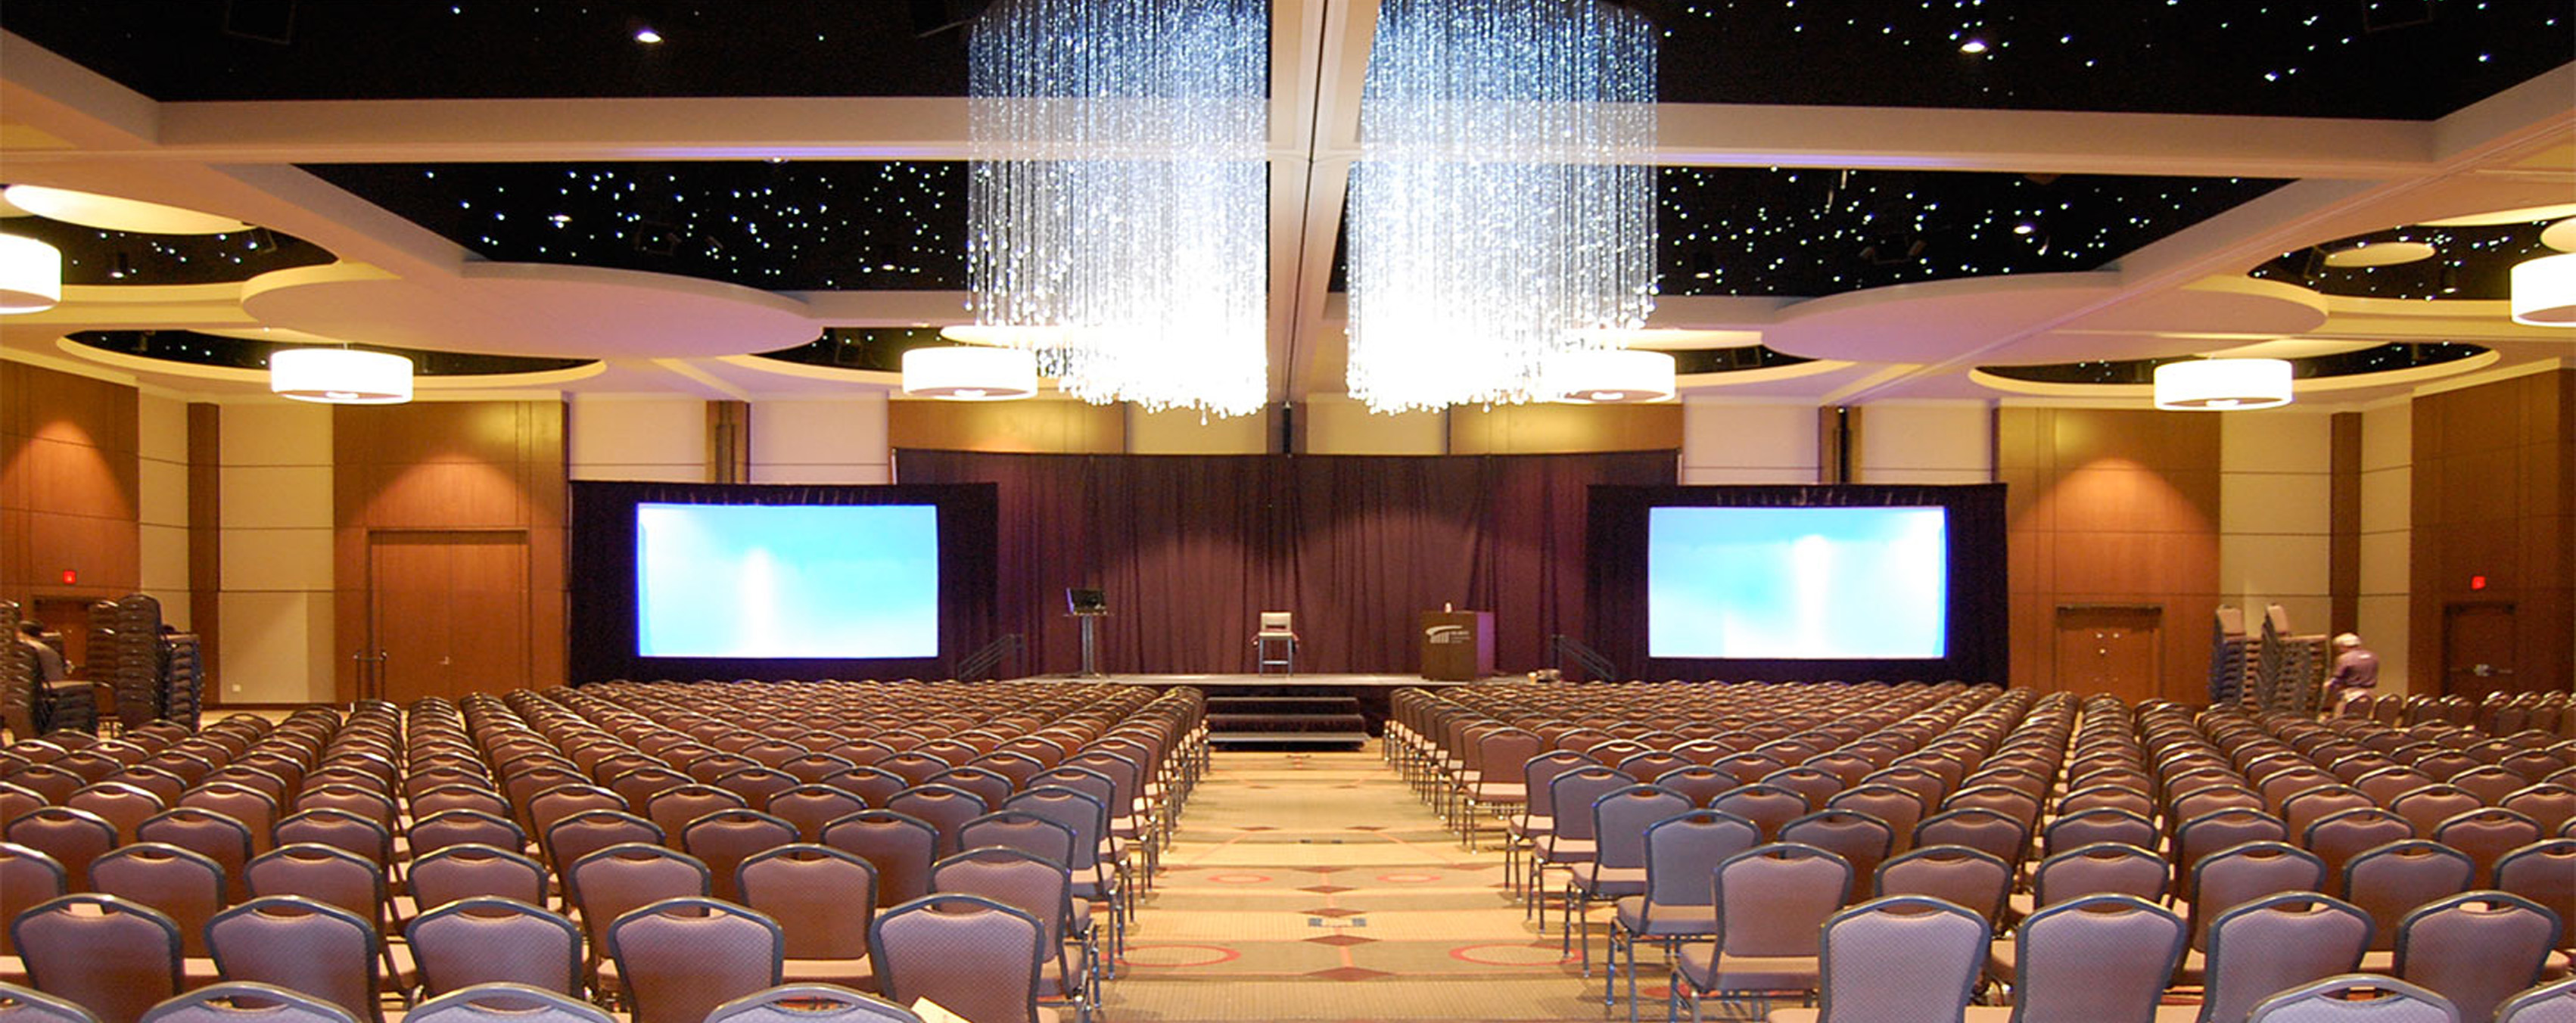 DFW Autism Conference Ballroom